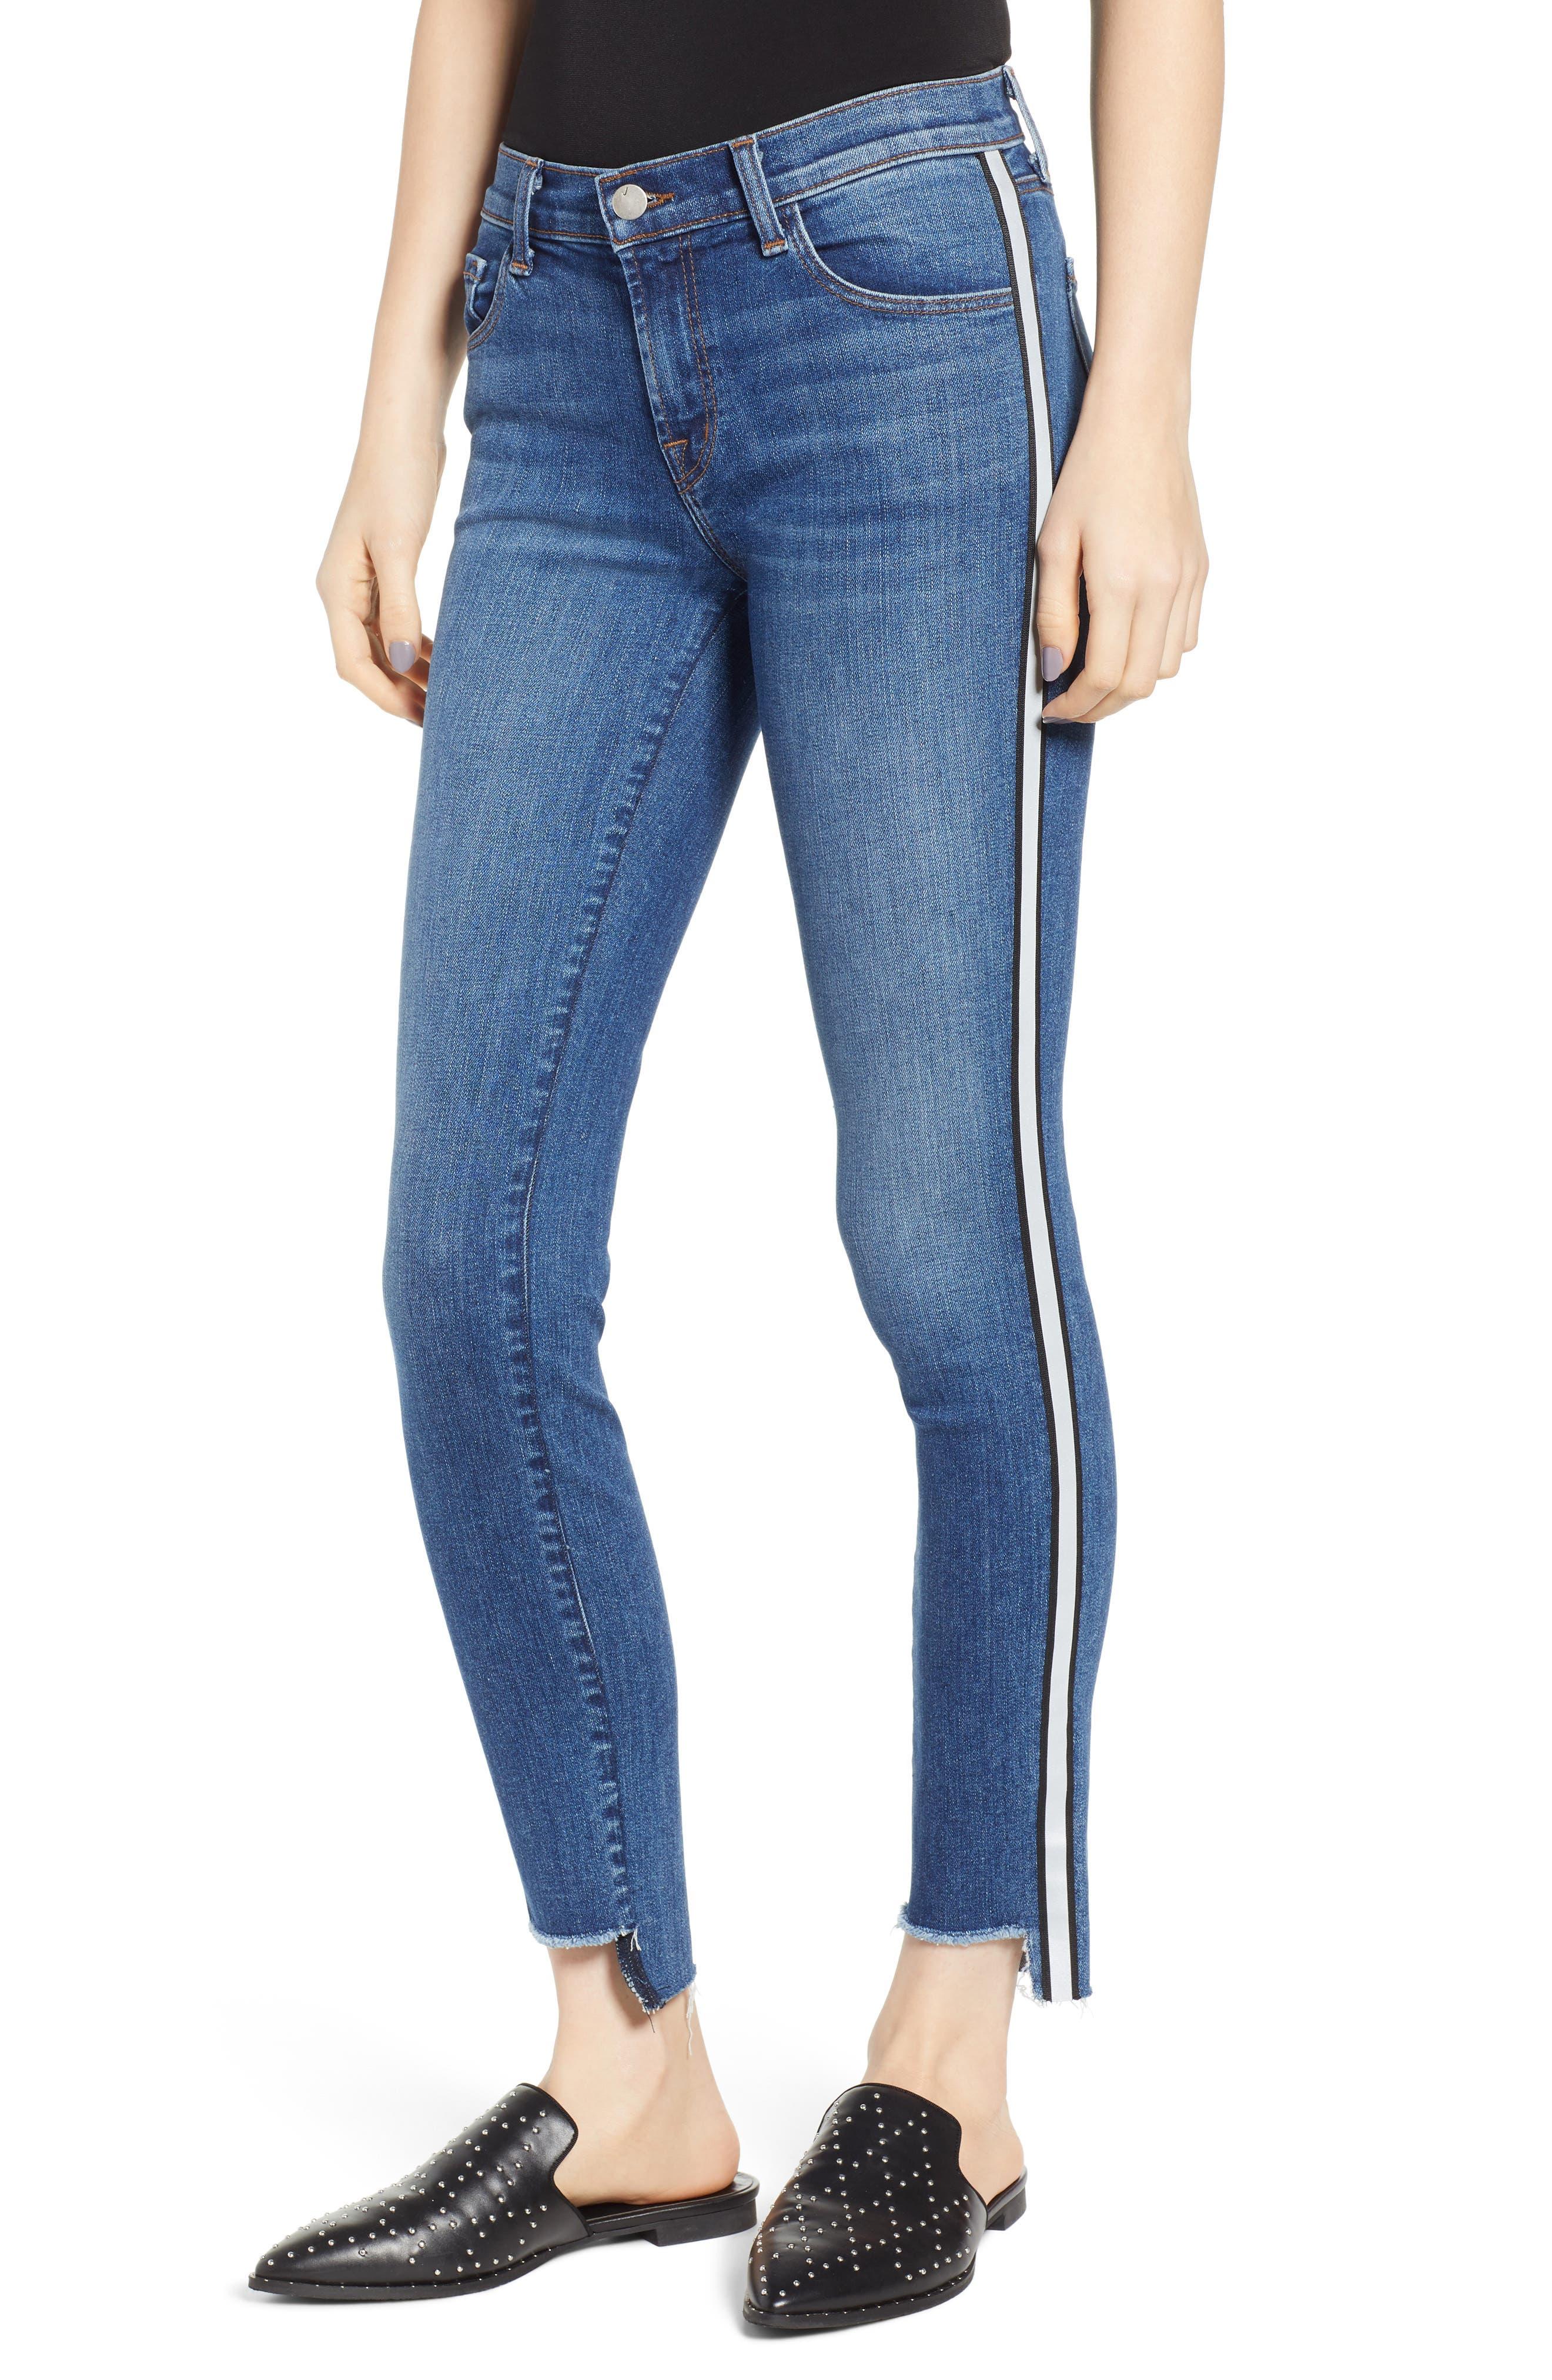 811 Skinny Jeans,                             Main thumbnail 1, color,                             REFLECTING